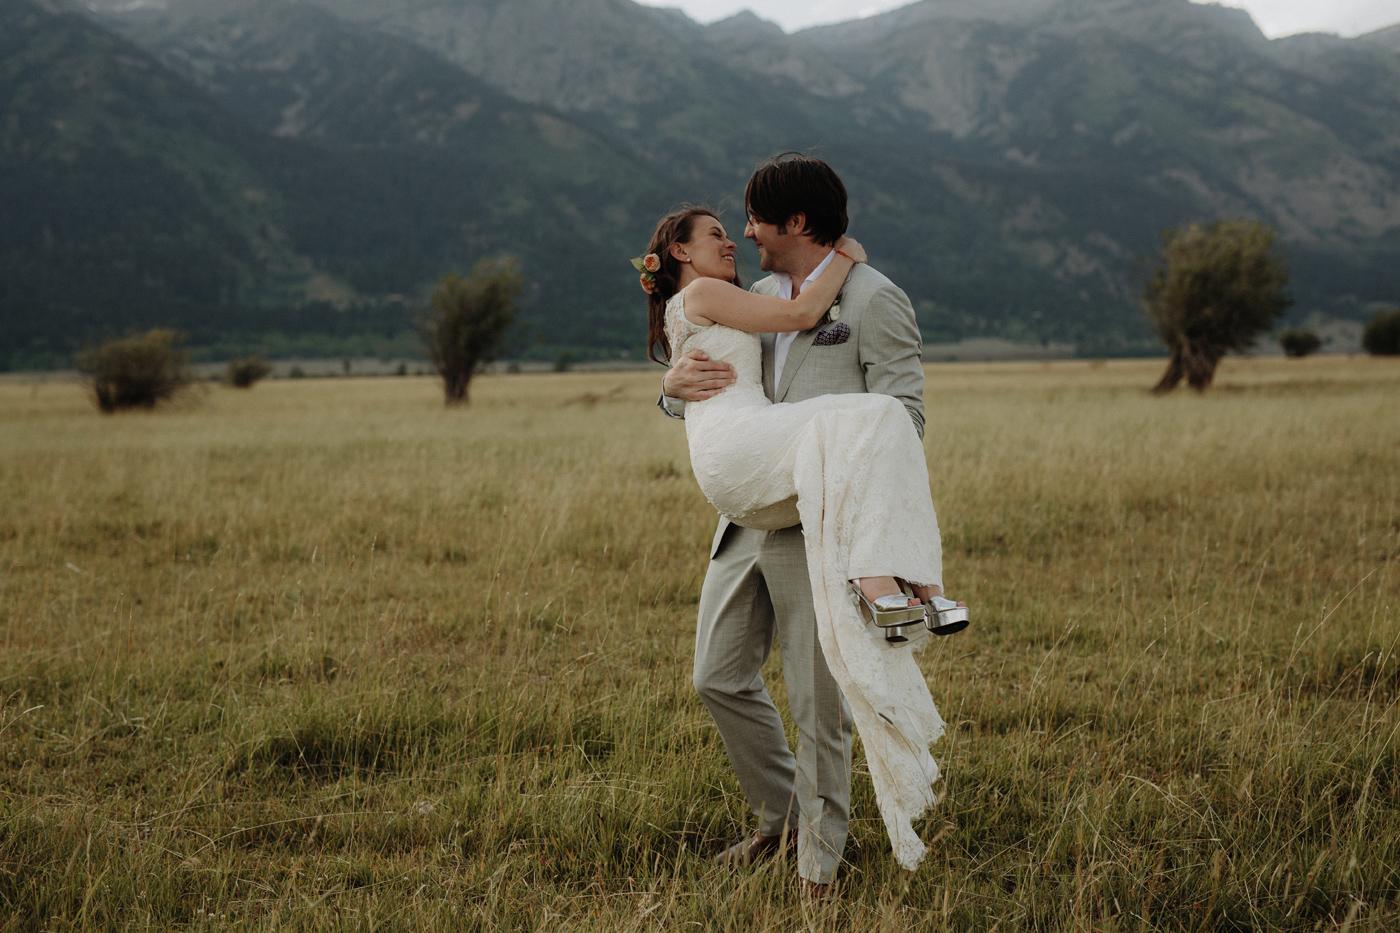 055-grand-teton-jackson-hole-wyoming-wedding.jpg